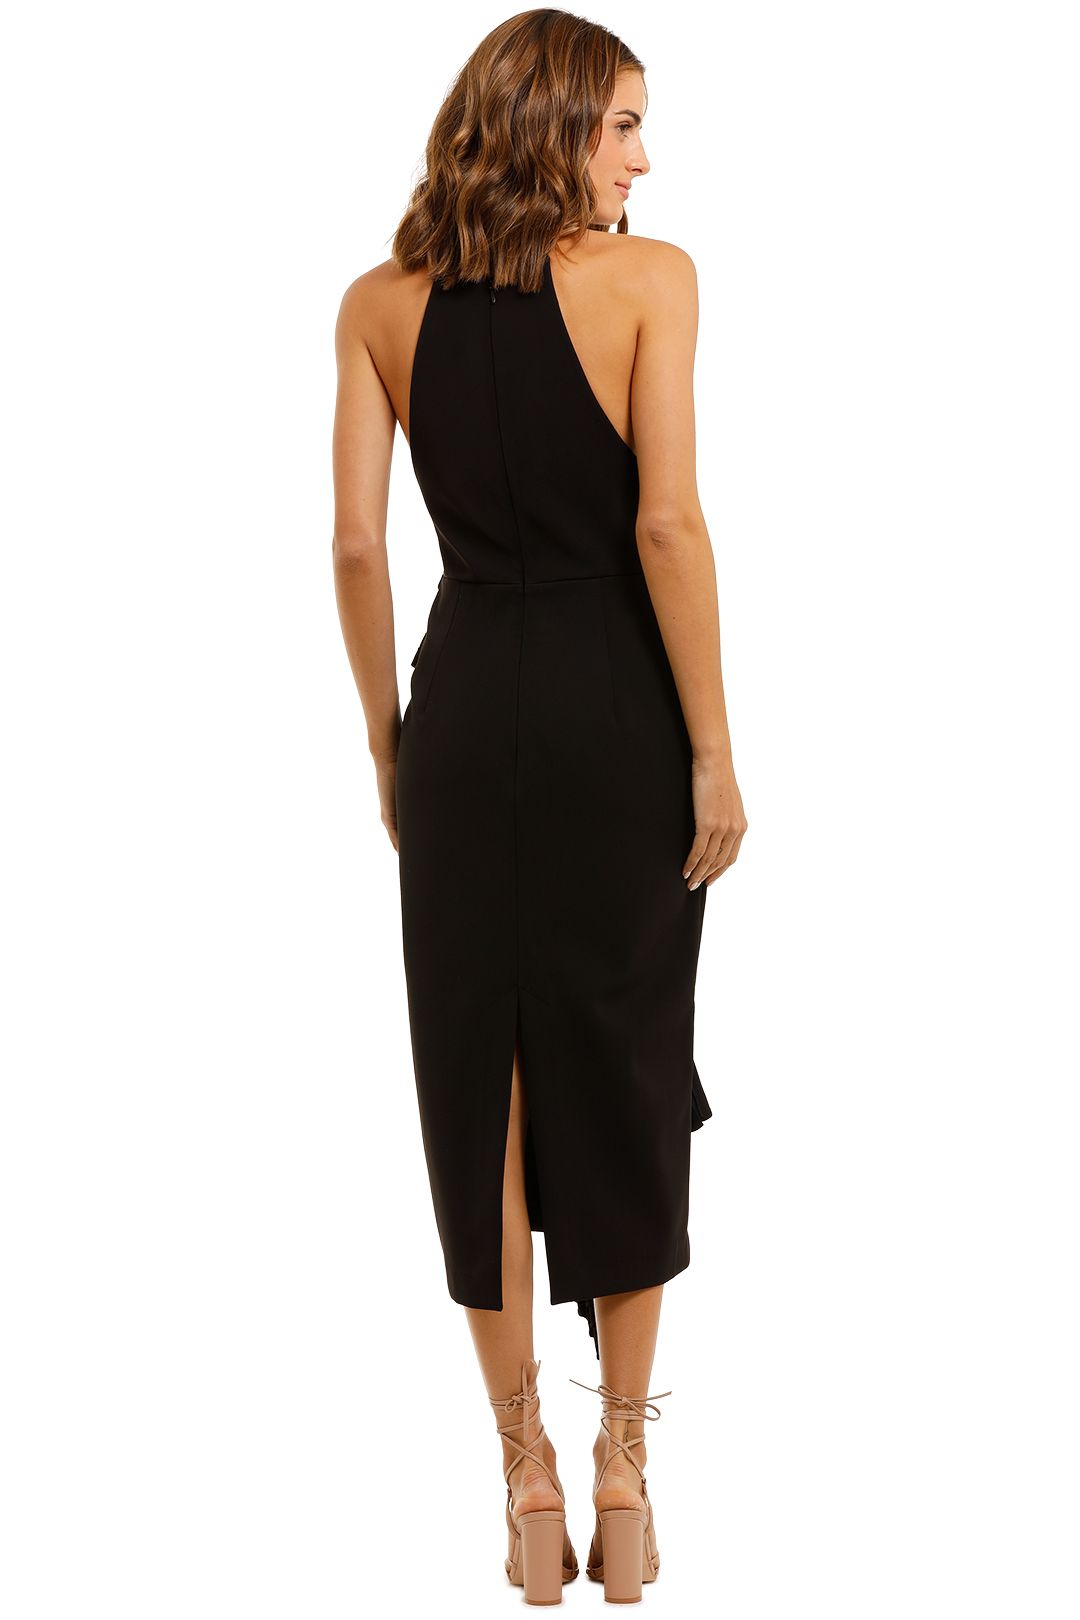 Acler Bercy Midi Dress Black